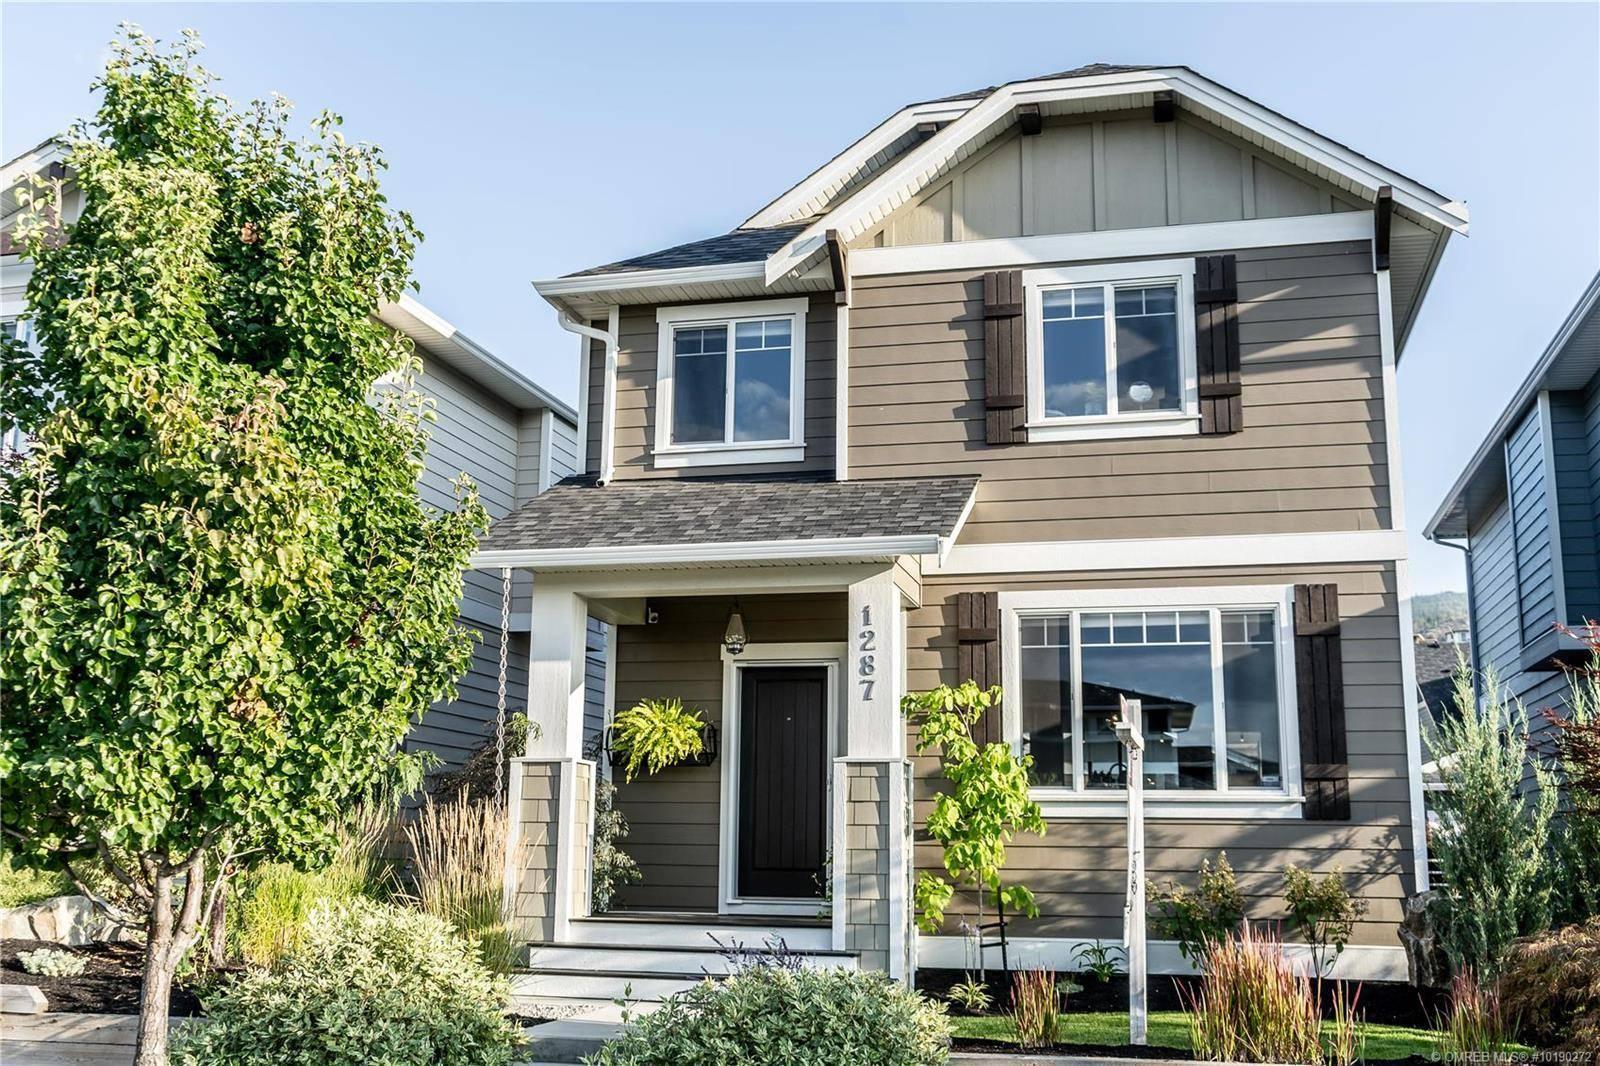 House for sale at 1287 Steele Rd Kelowna British Columbia - MLS: 10190272